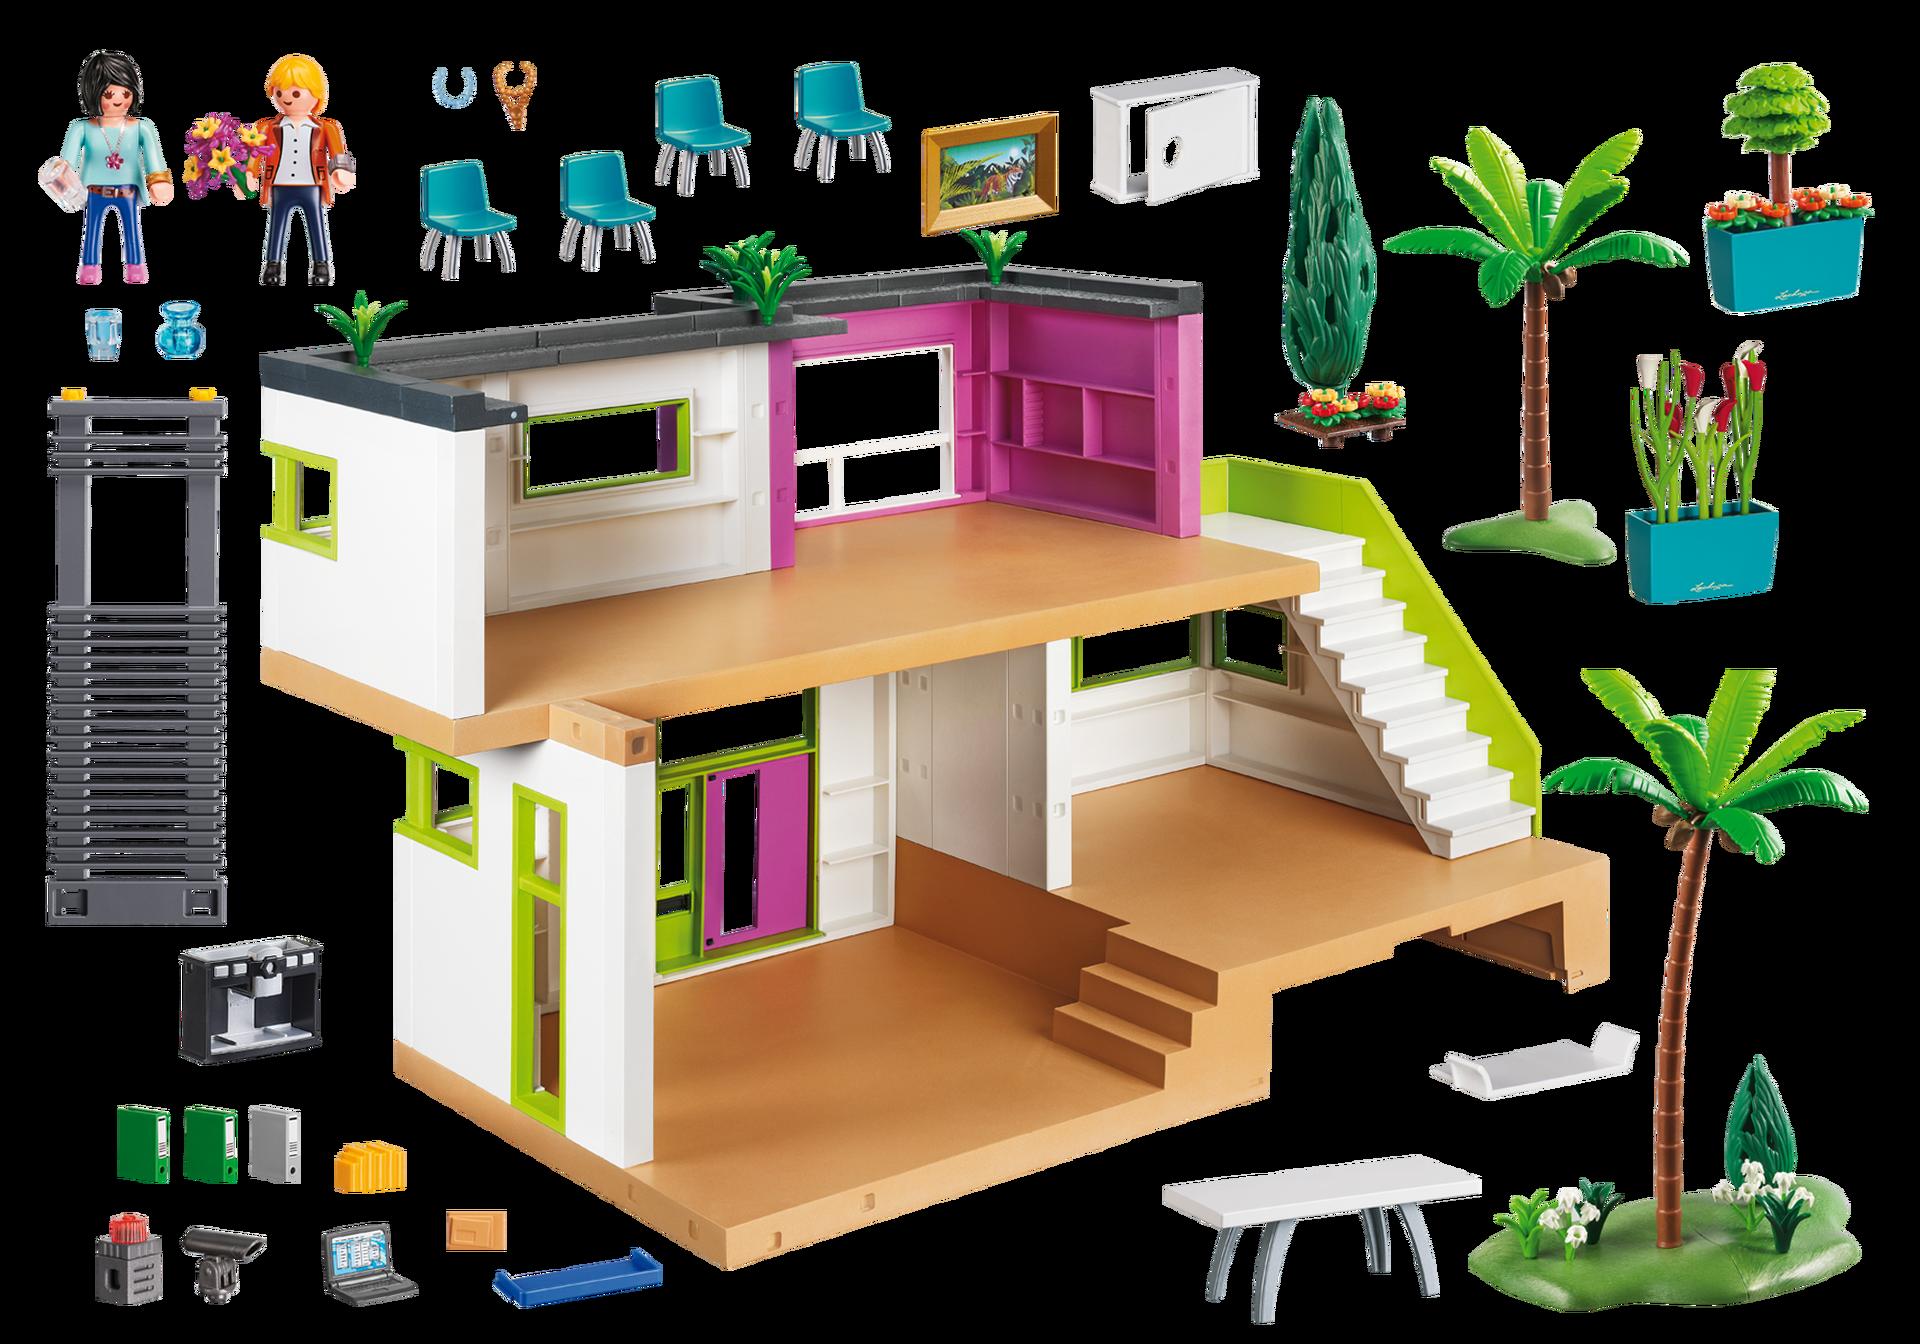 moderne luxusvilla 5574 playmobil schweiz. Black Bedroom Furniture Sets. Home Design Ideas